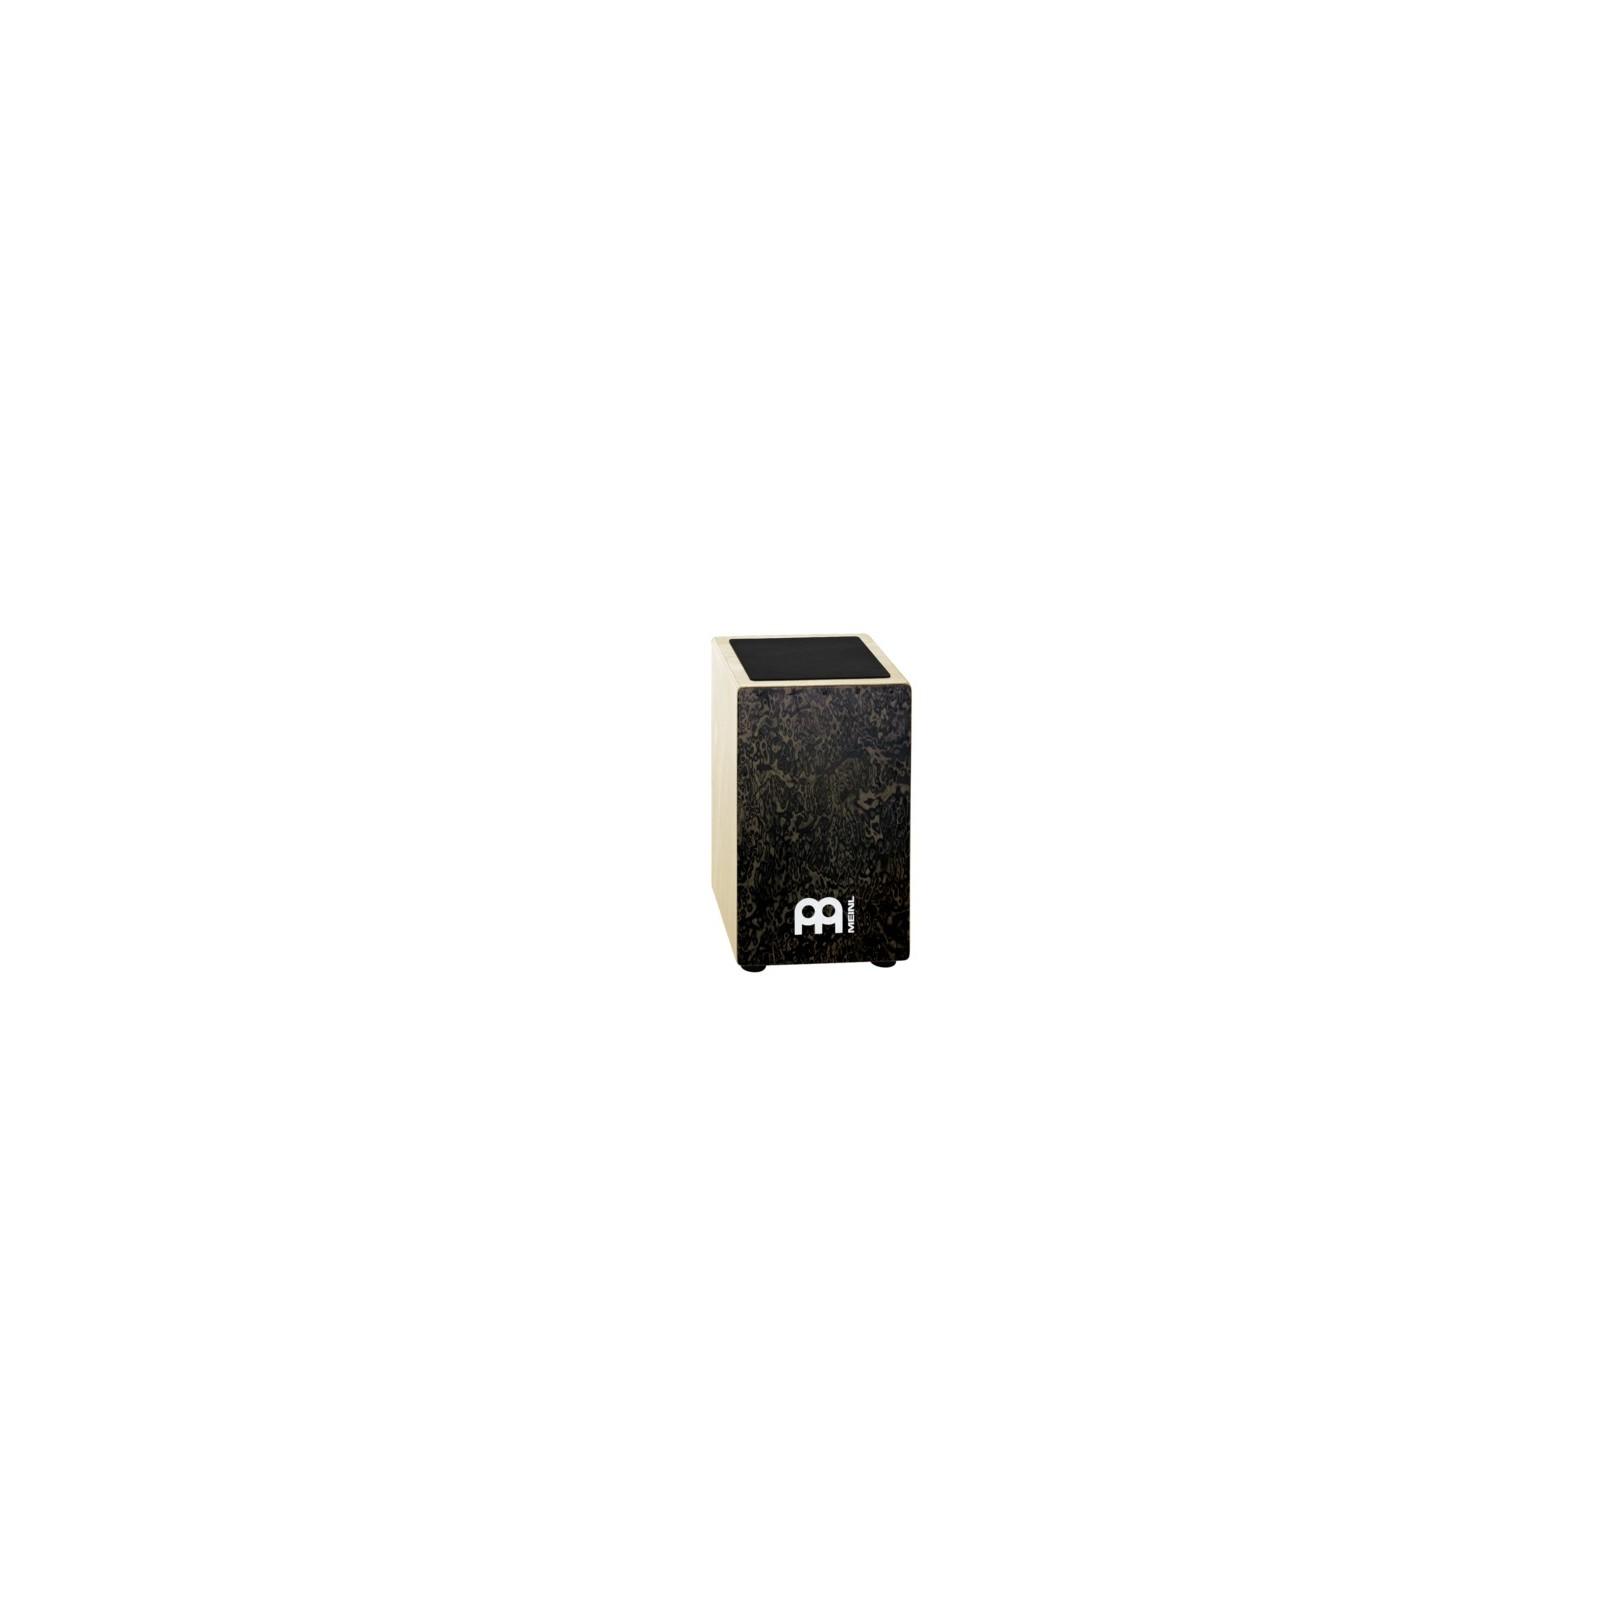 Cajon (Meinl) Makhaburl Frontplatte (schwarz)